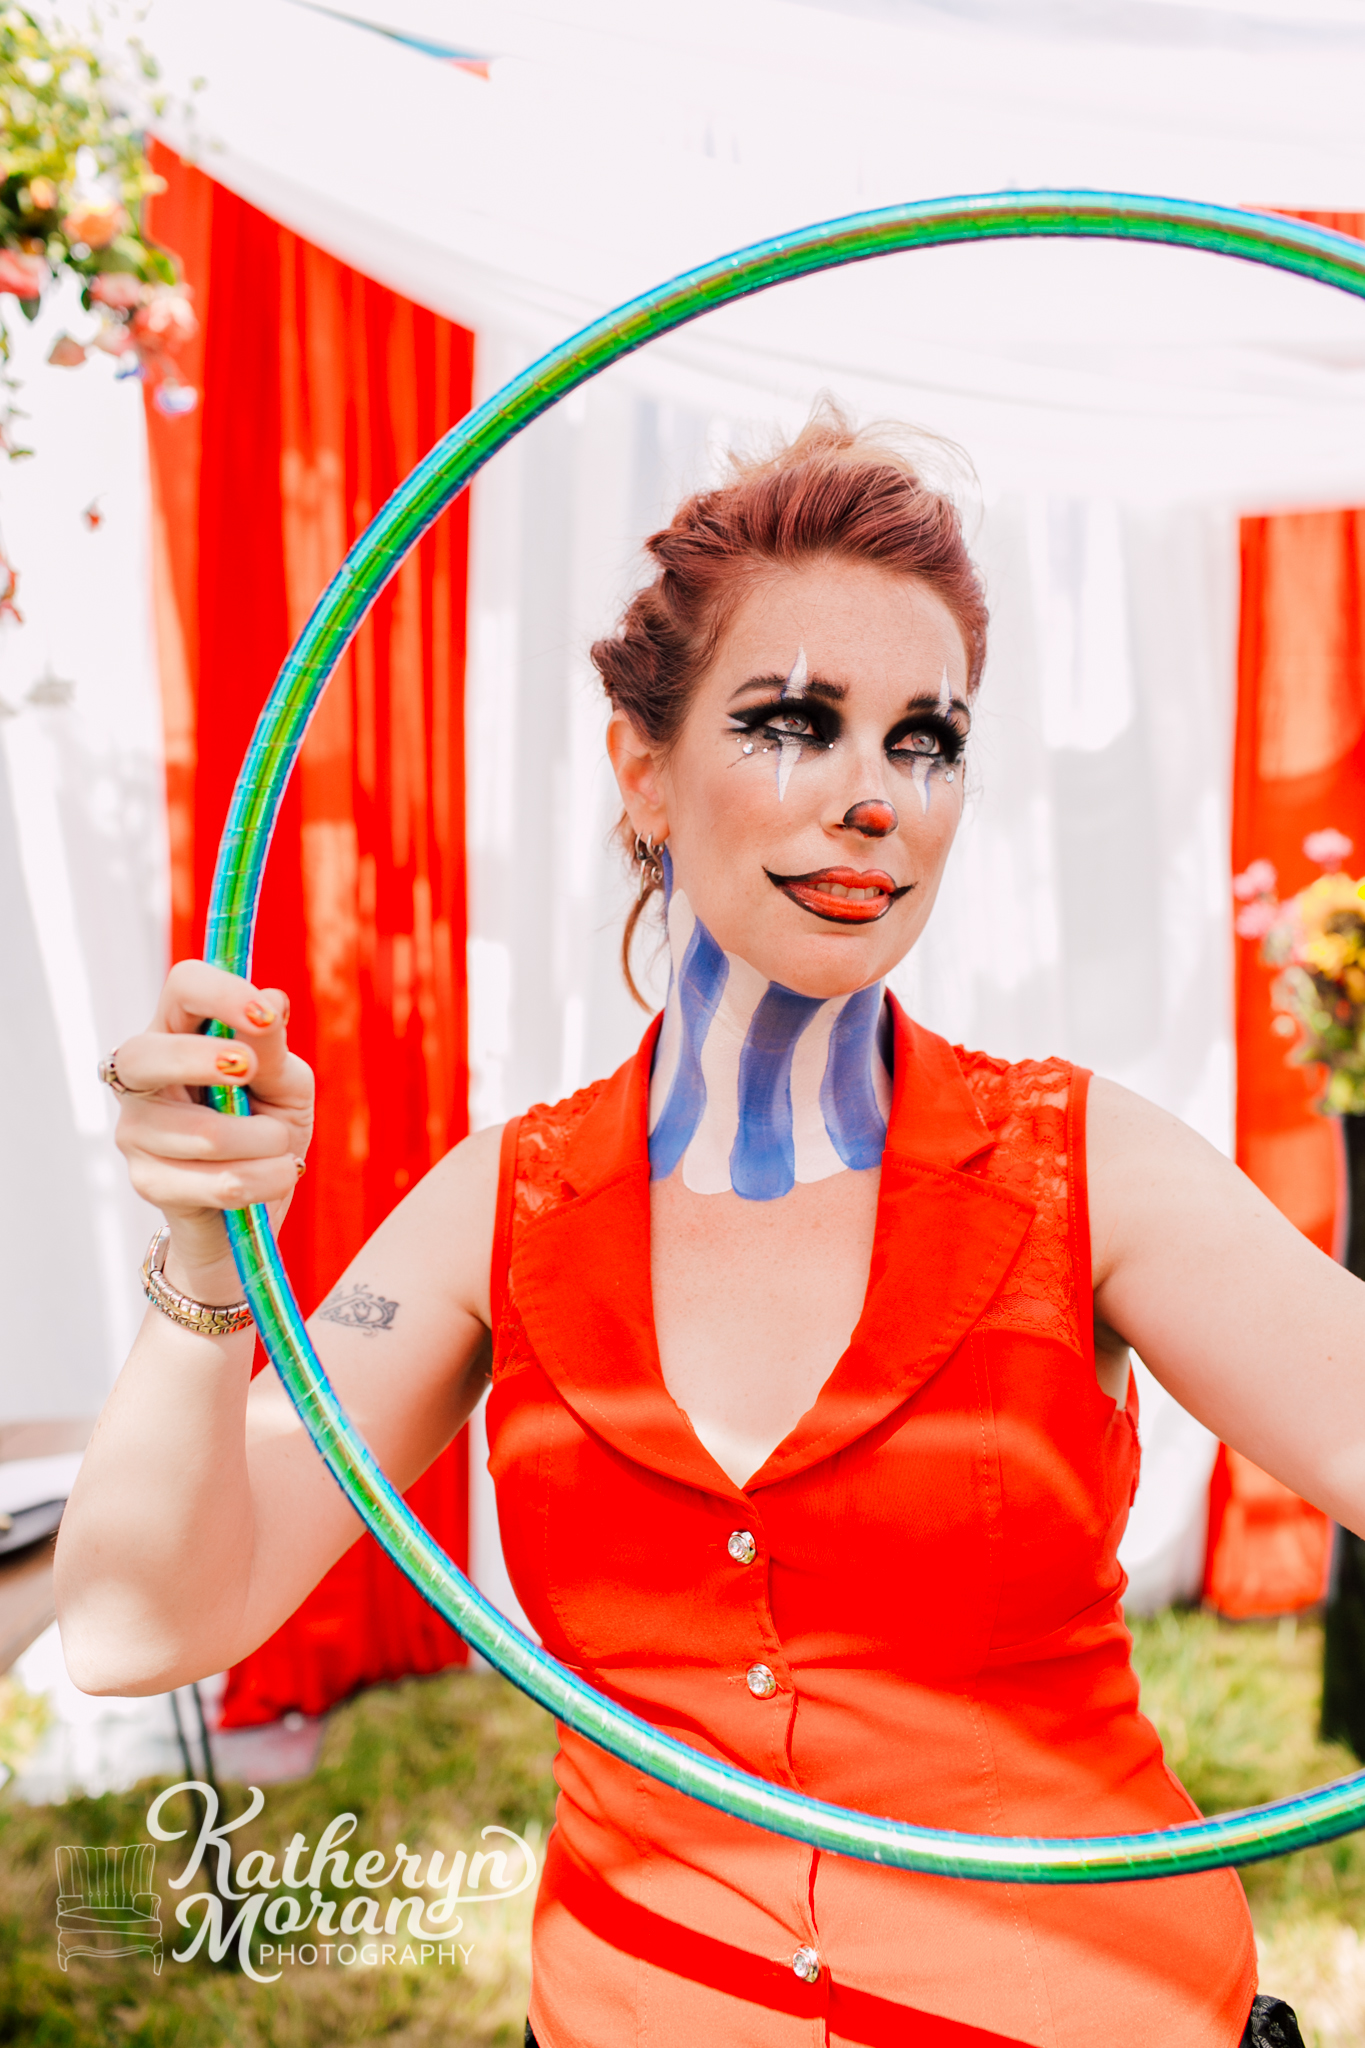 bellingham-seattle-event-photographer-vintage-circus-styled-katheryn-moran-180.jpg